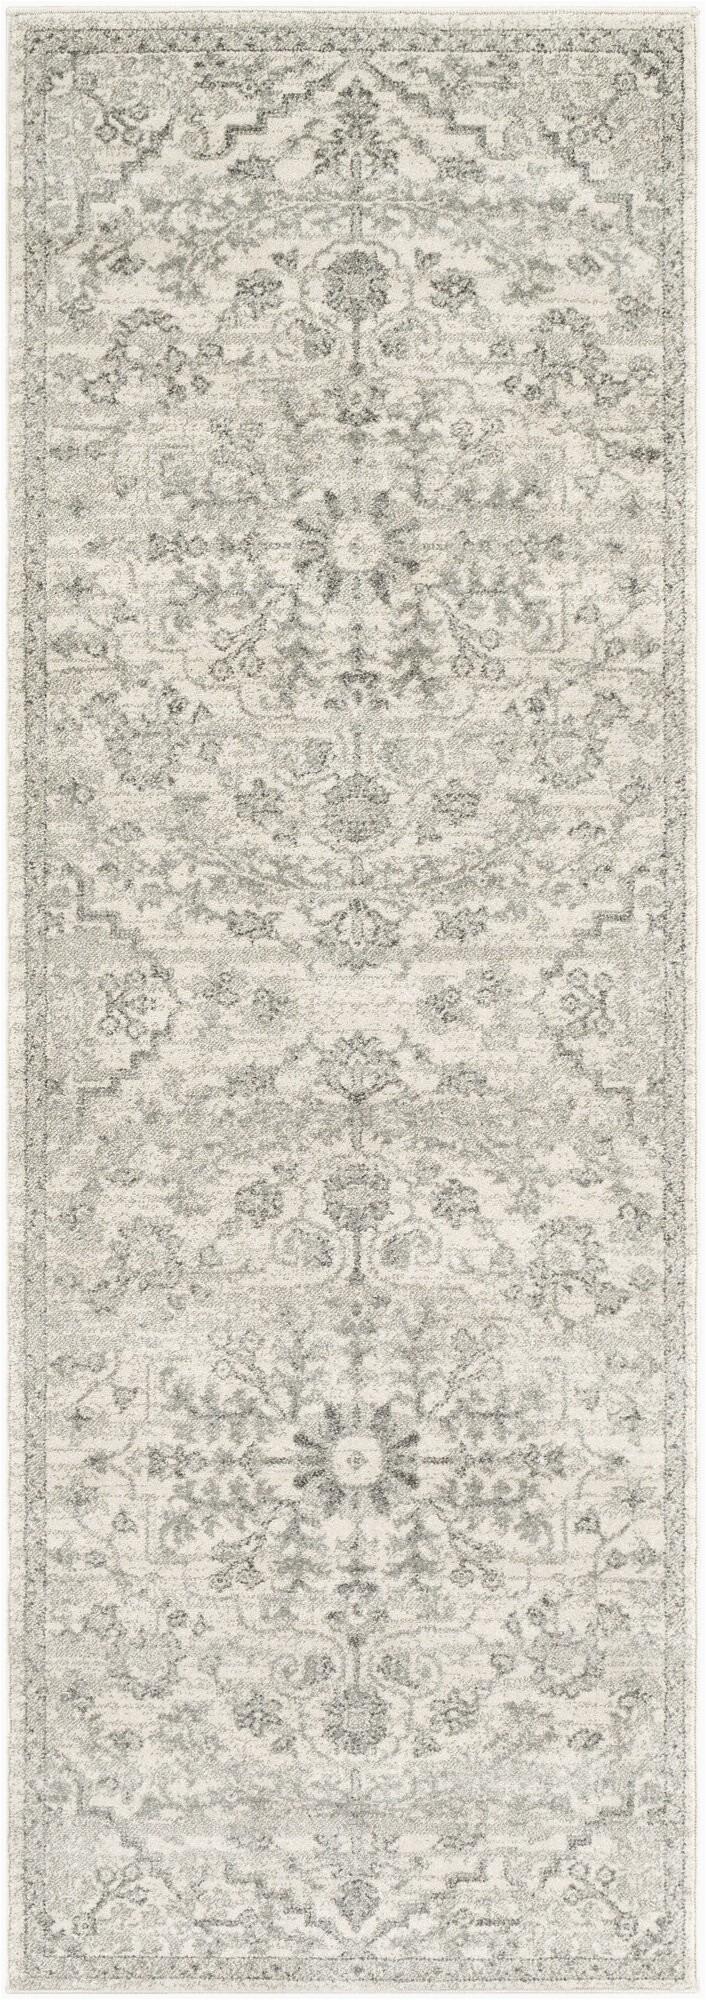 mistana hillsby beigelight gray area rug mitn2359 piid=